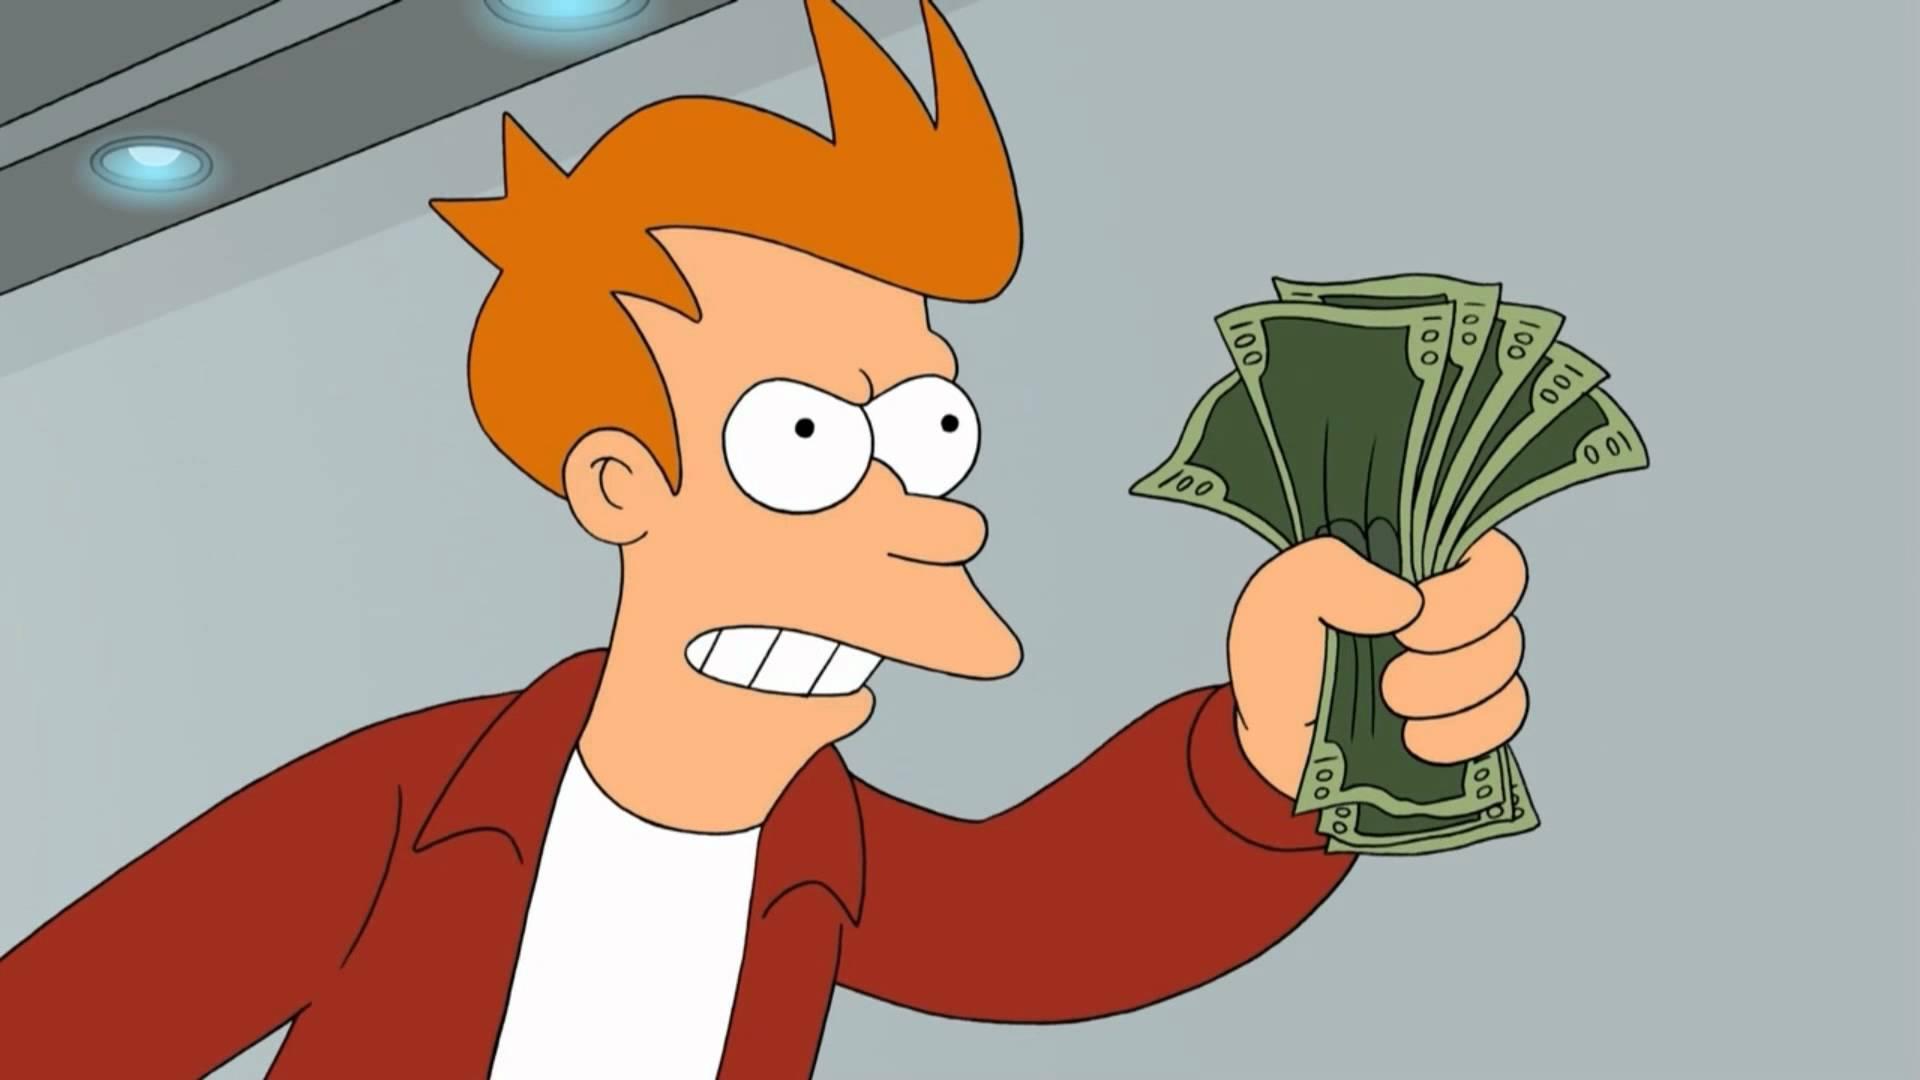 Fry holding money